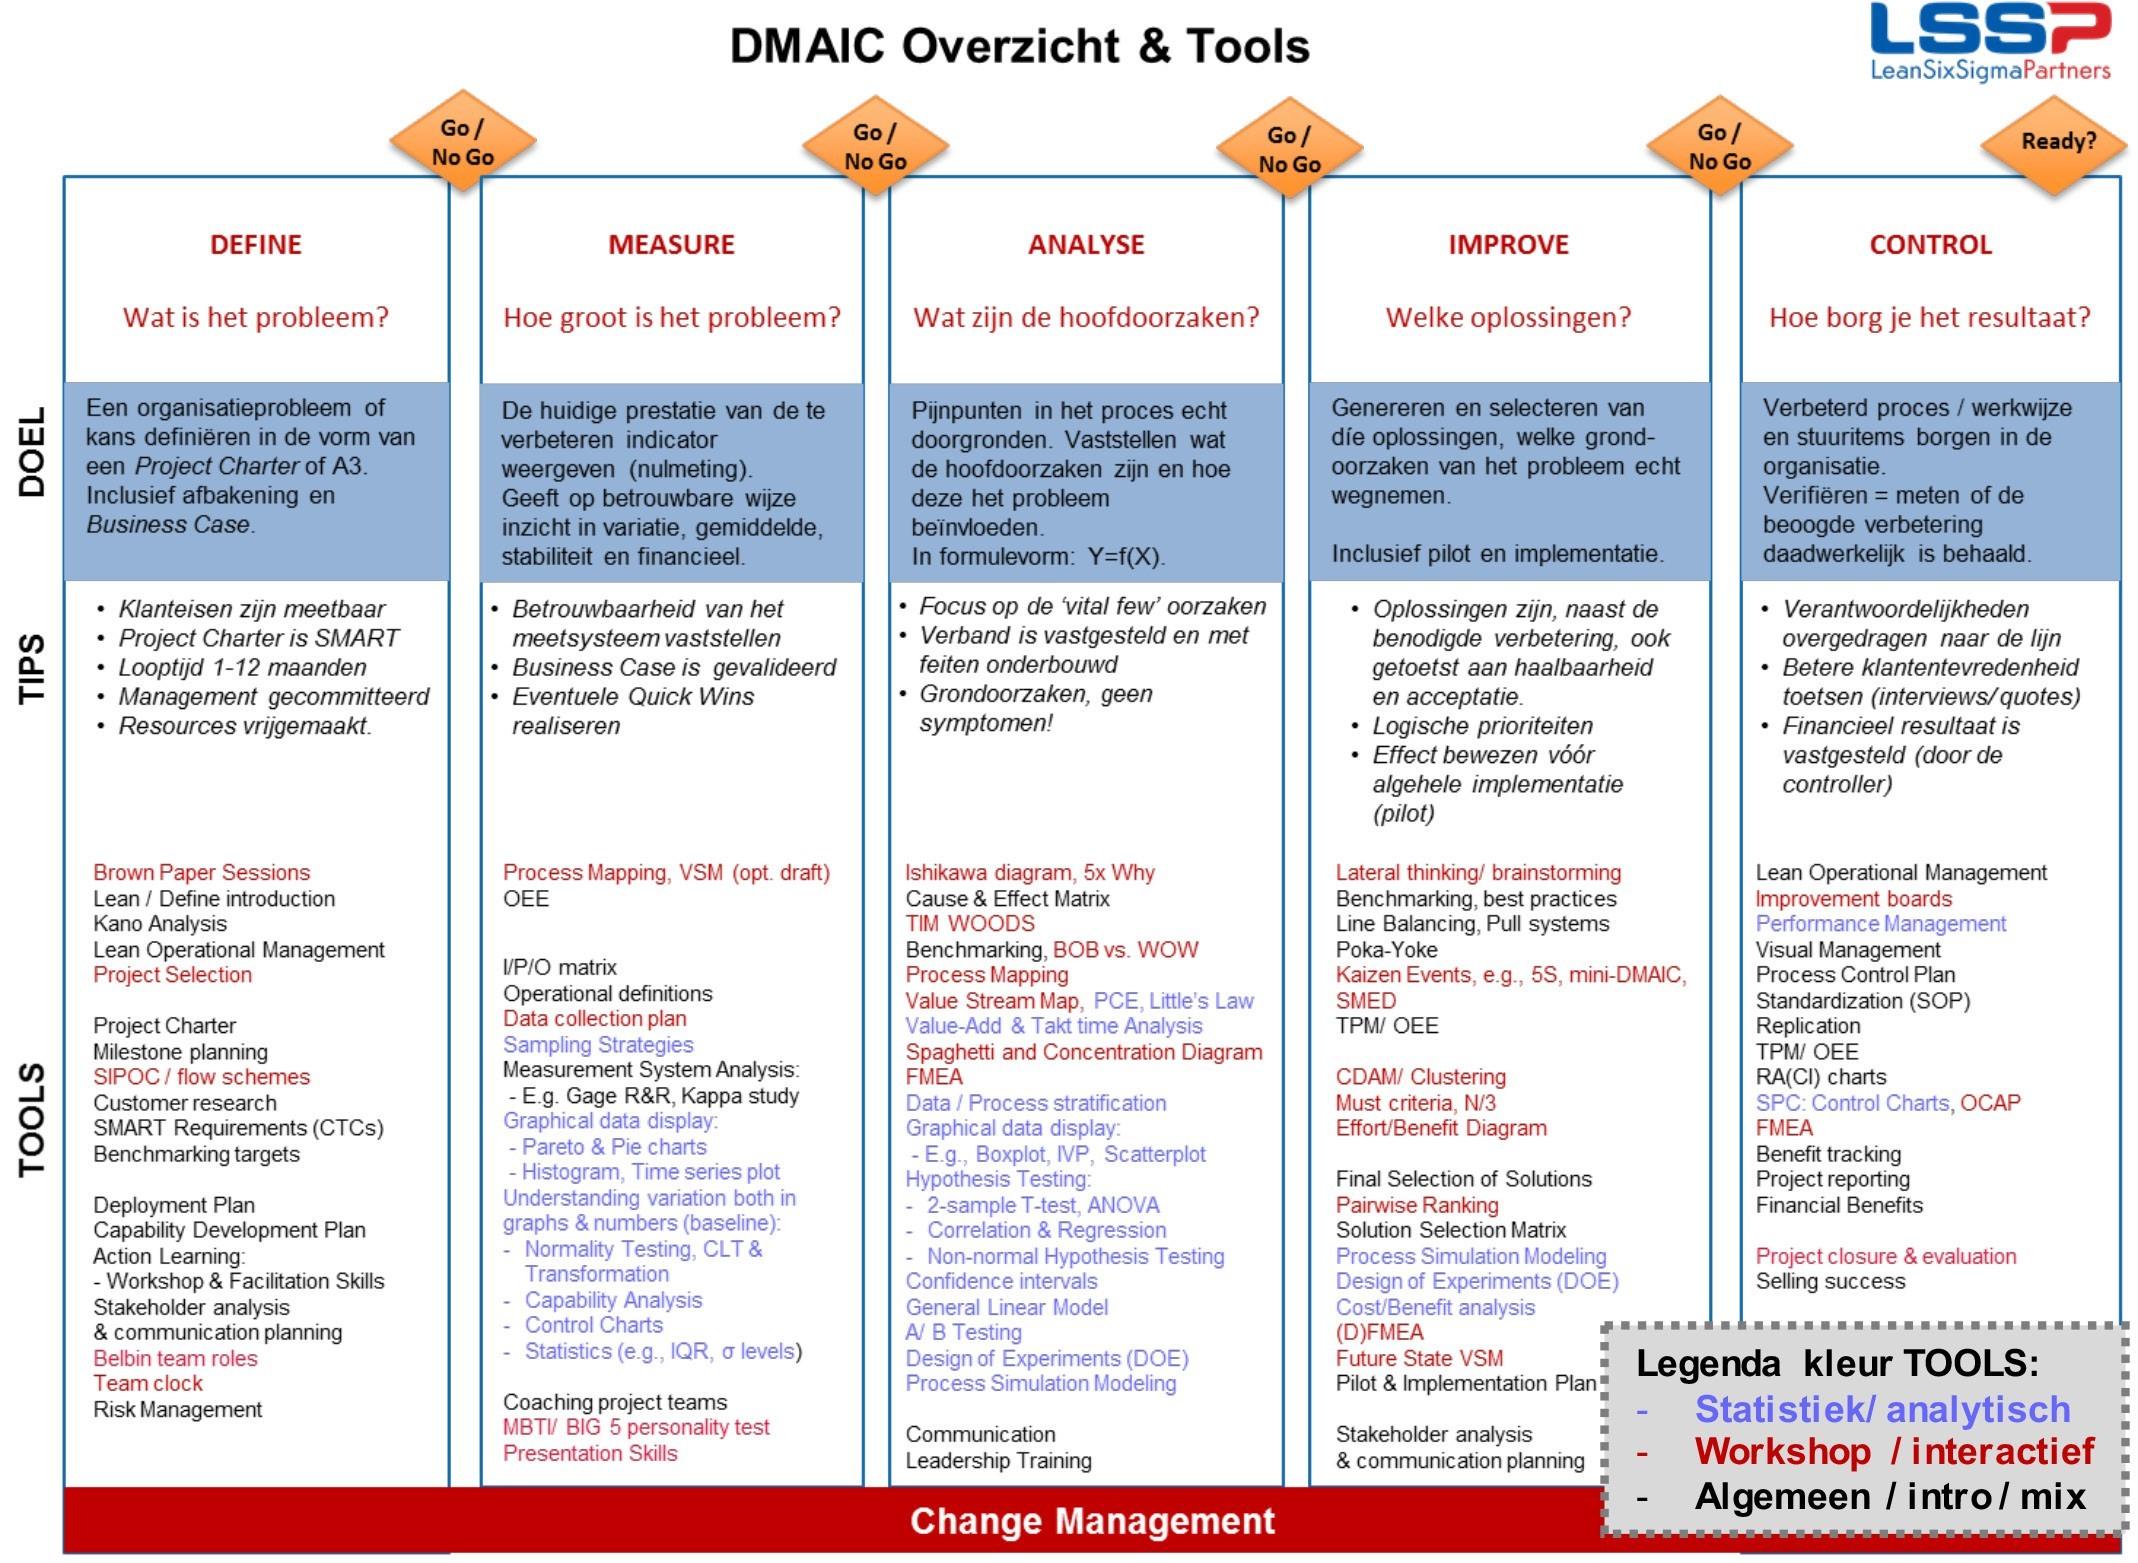 DMAIC overview.jpg